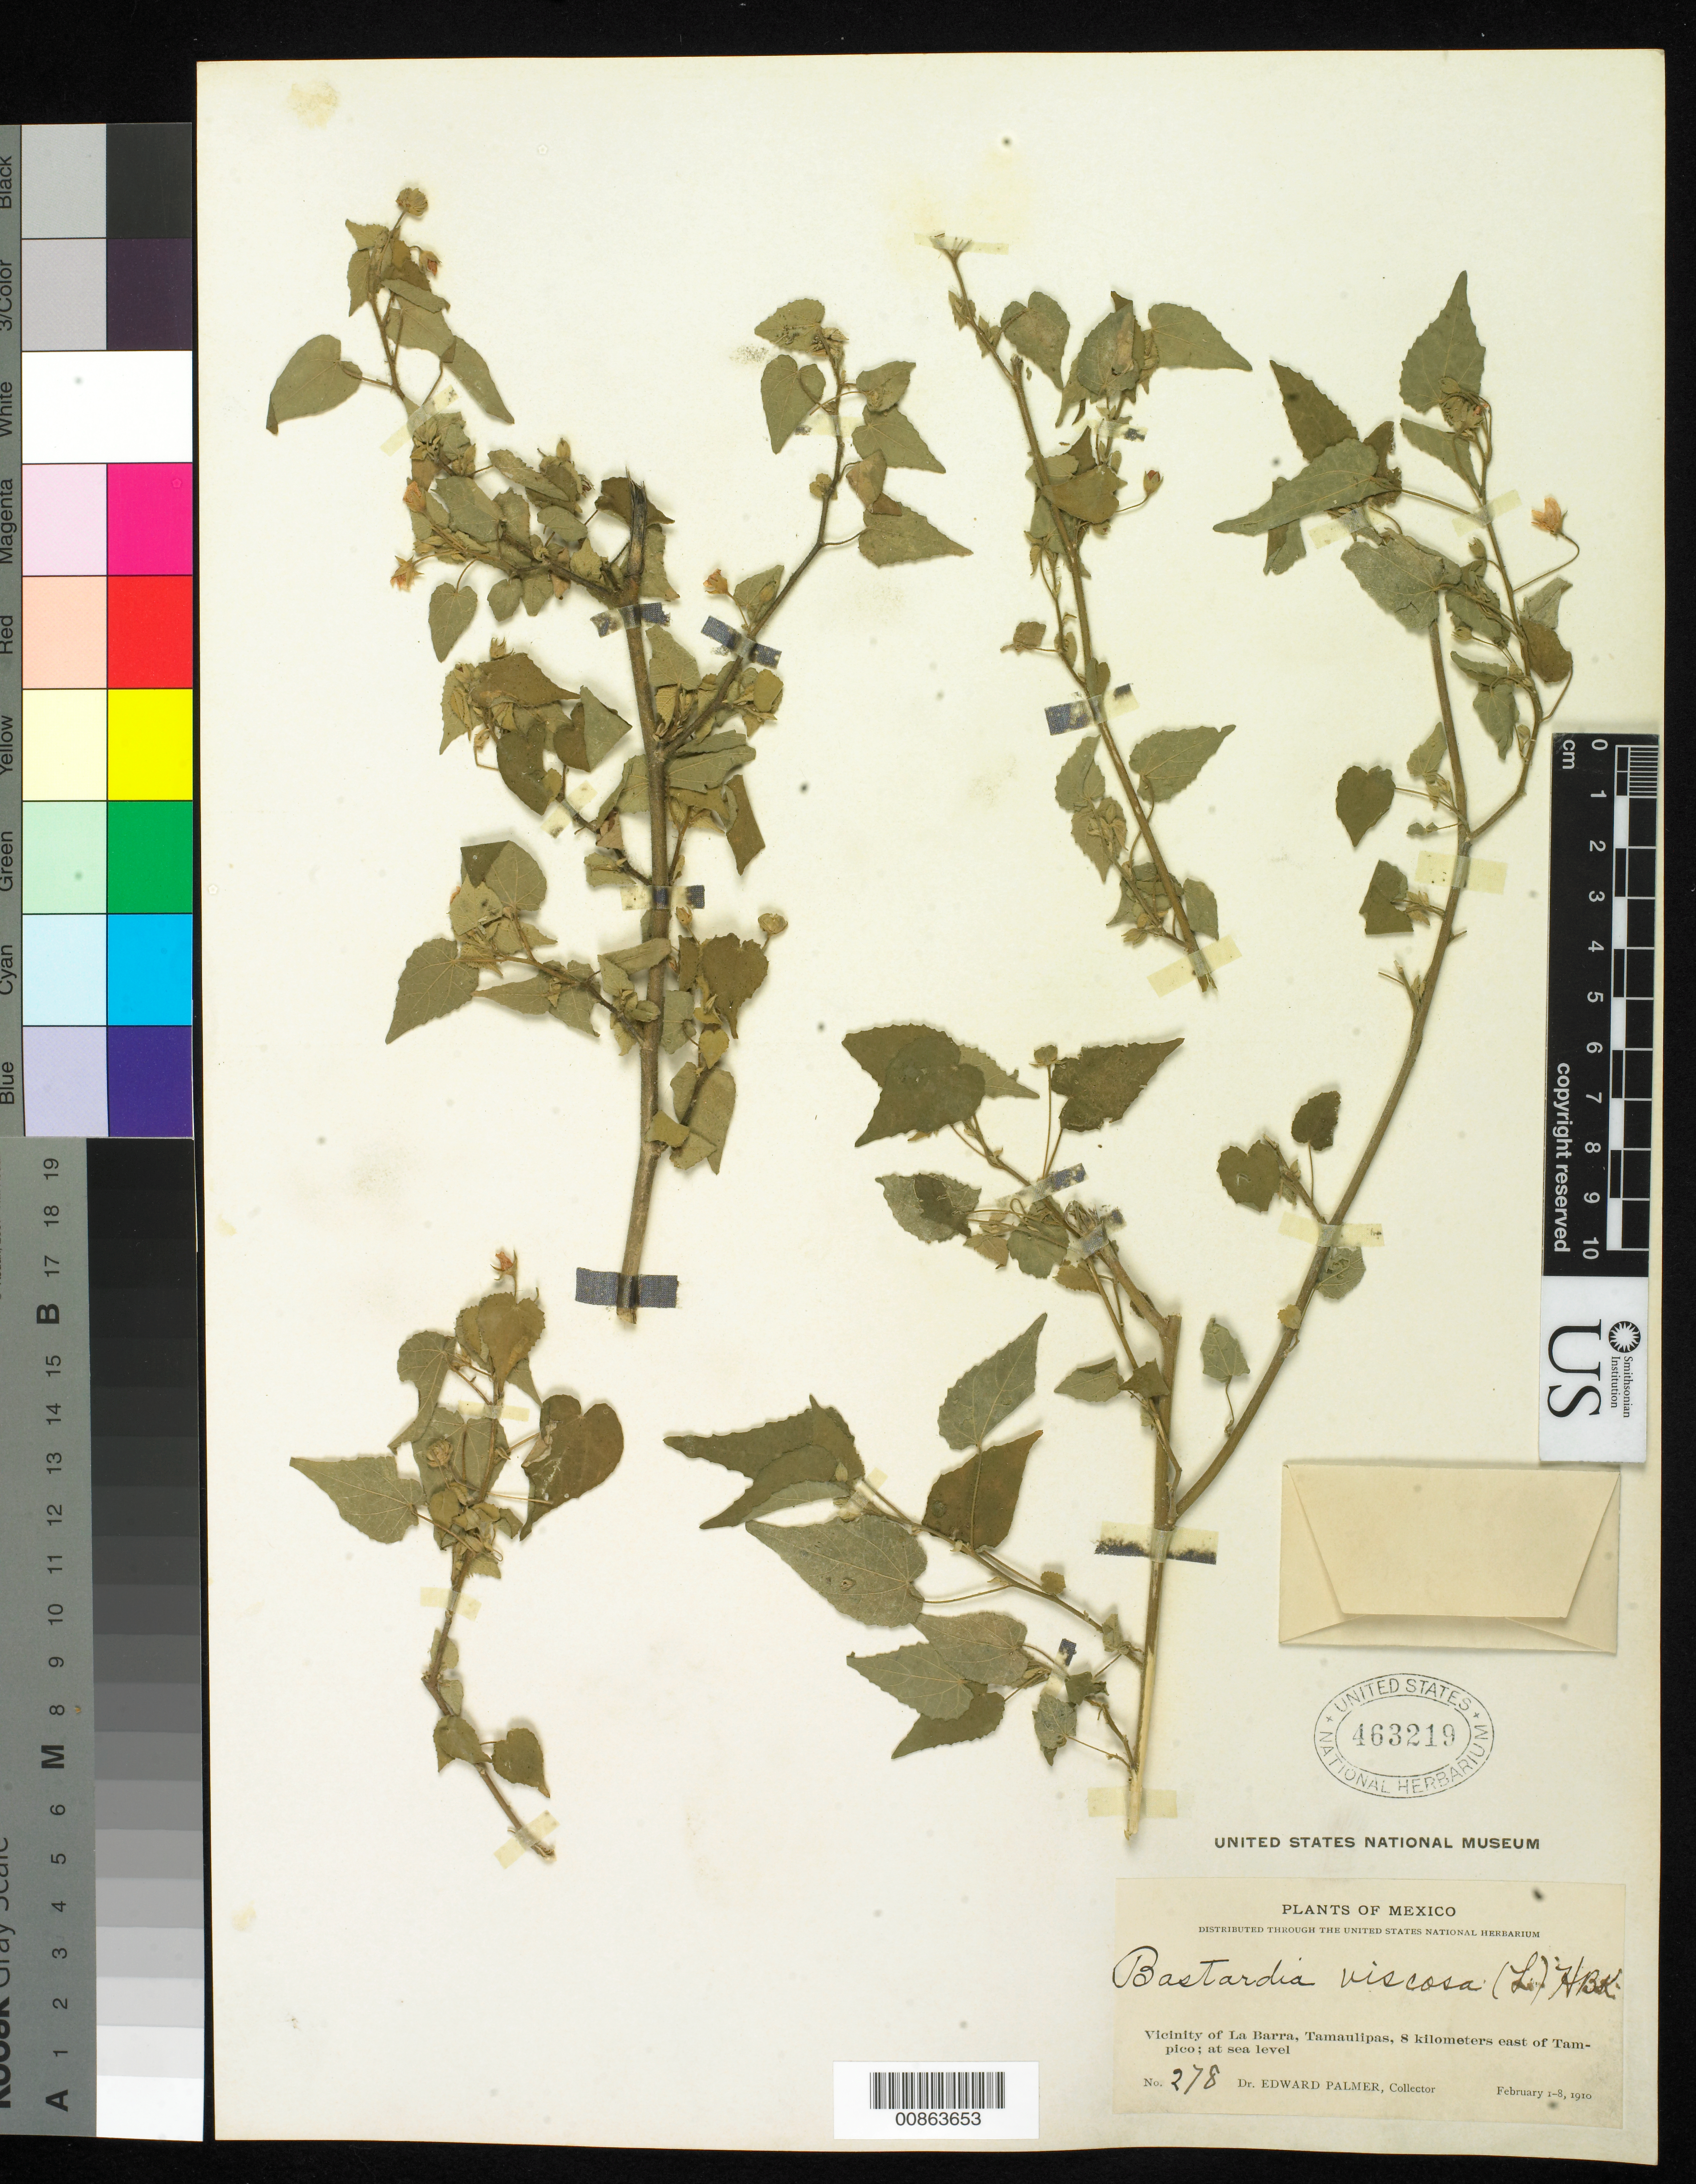 Bastardia viscosa image